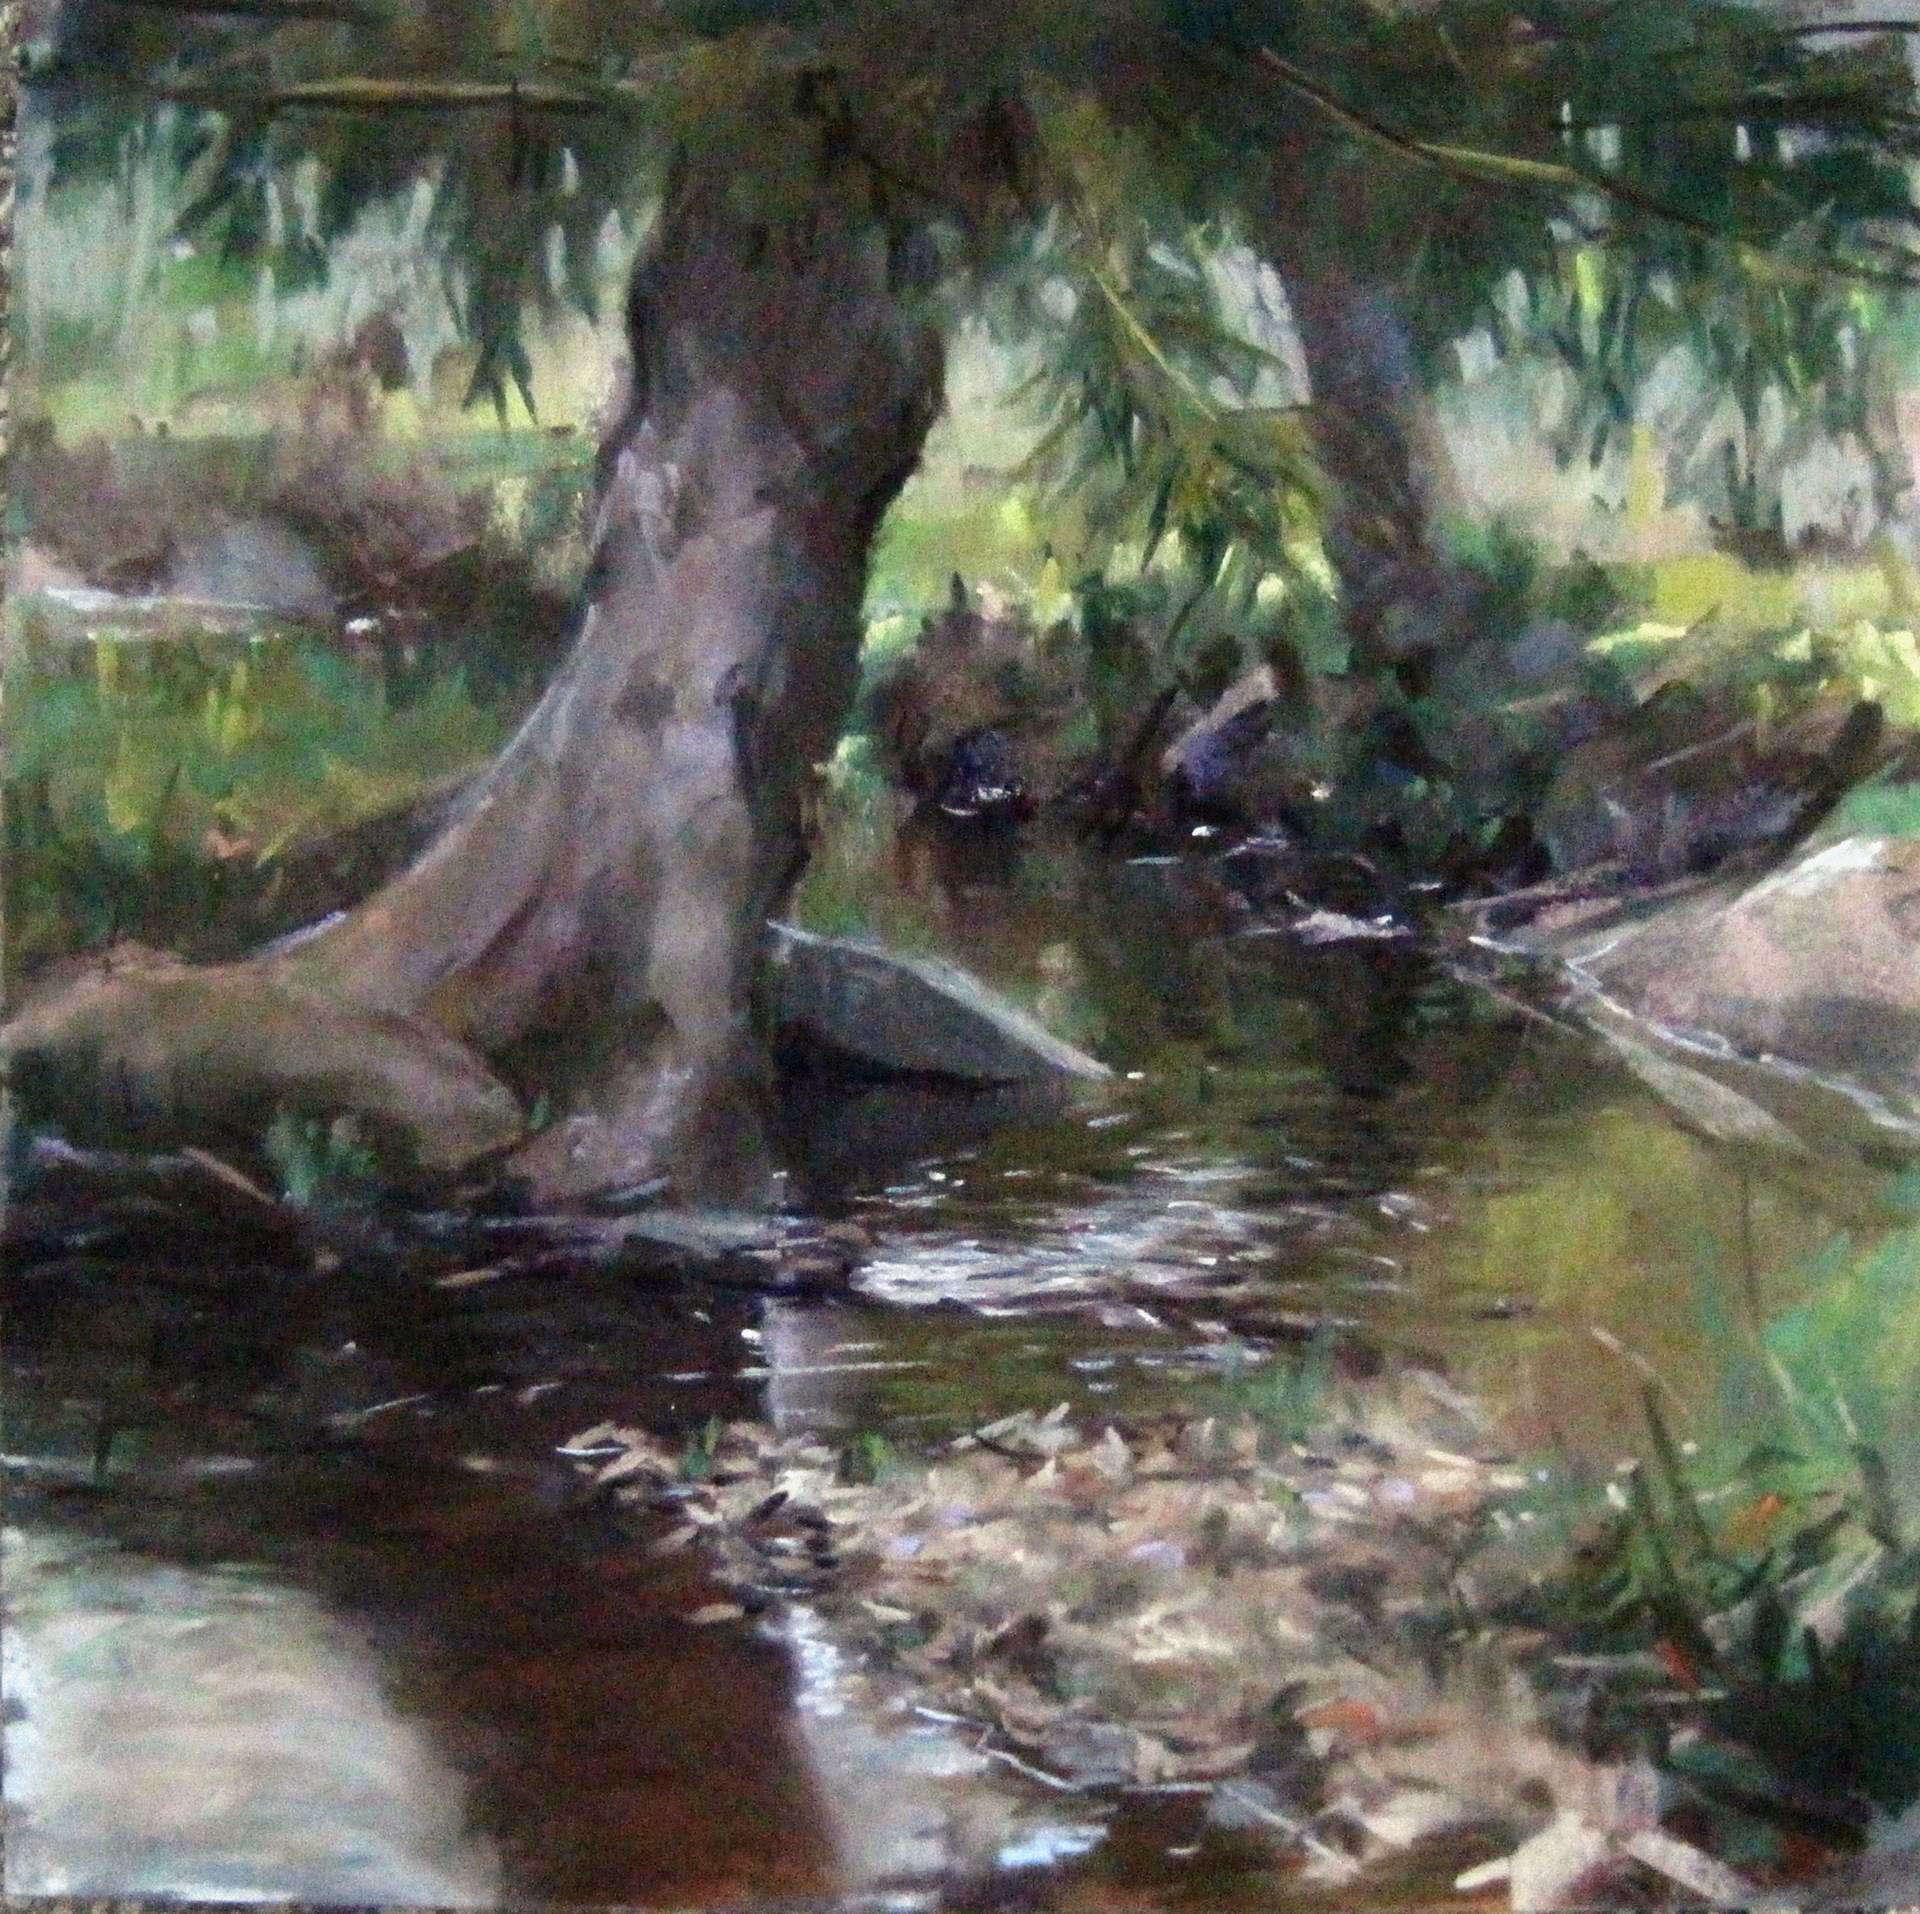 Ray Hassard | DARBY CREEK IDYLL | soft pastel | frame size 18x18